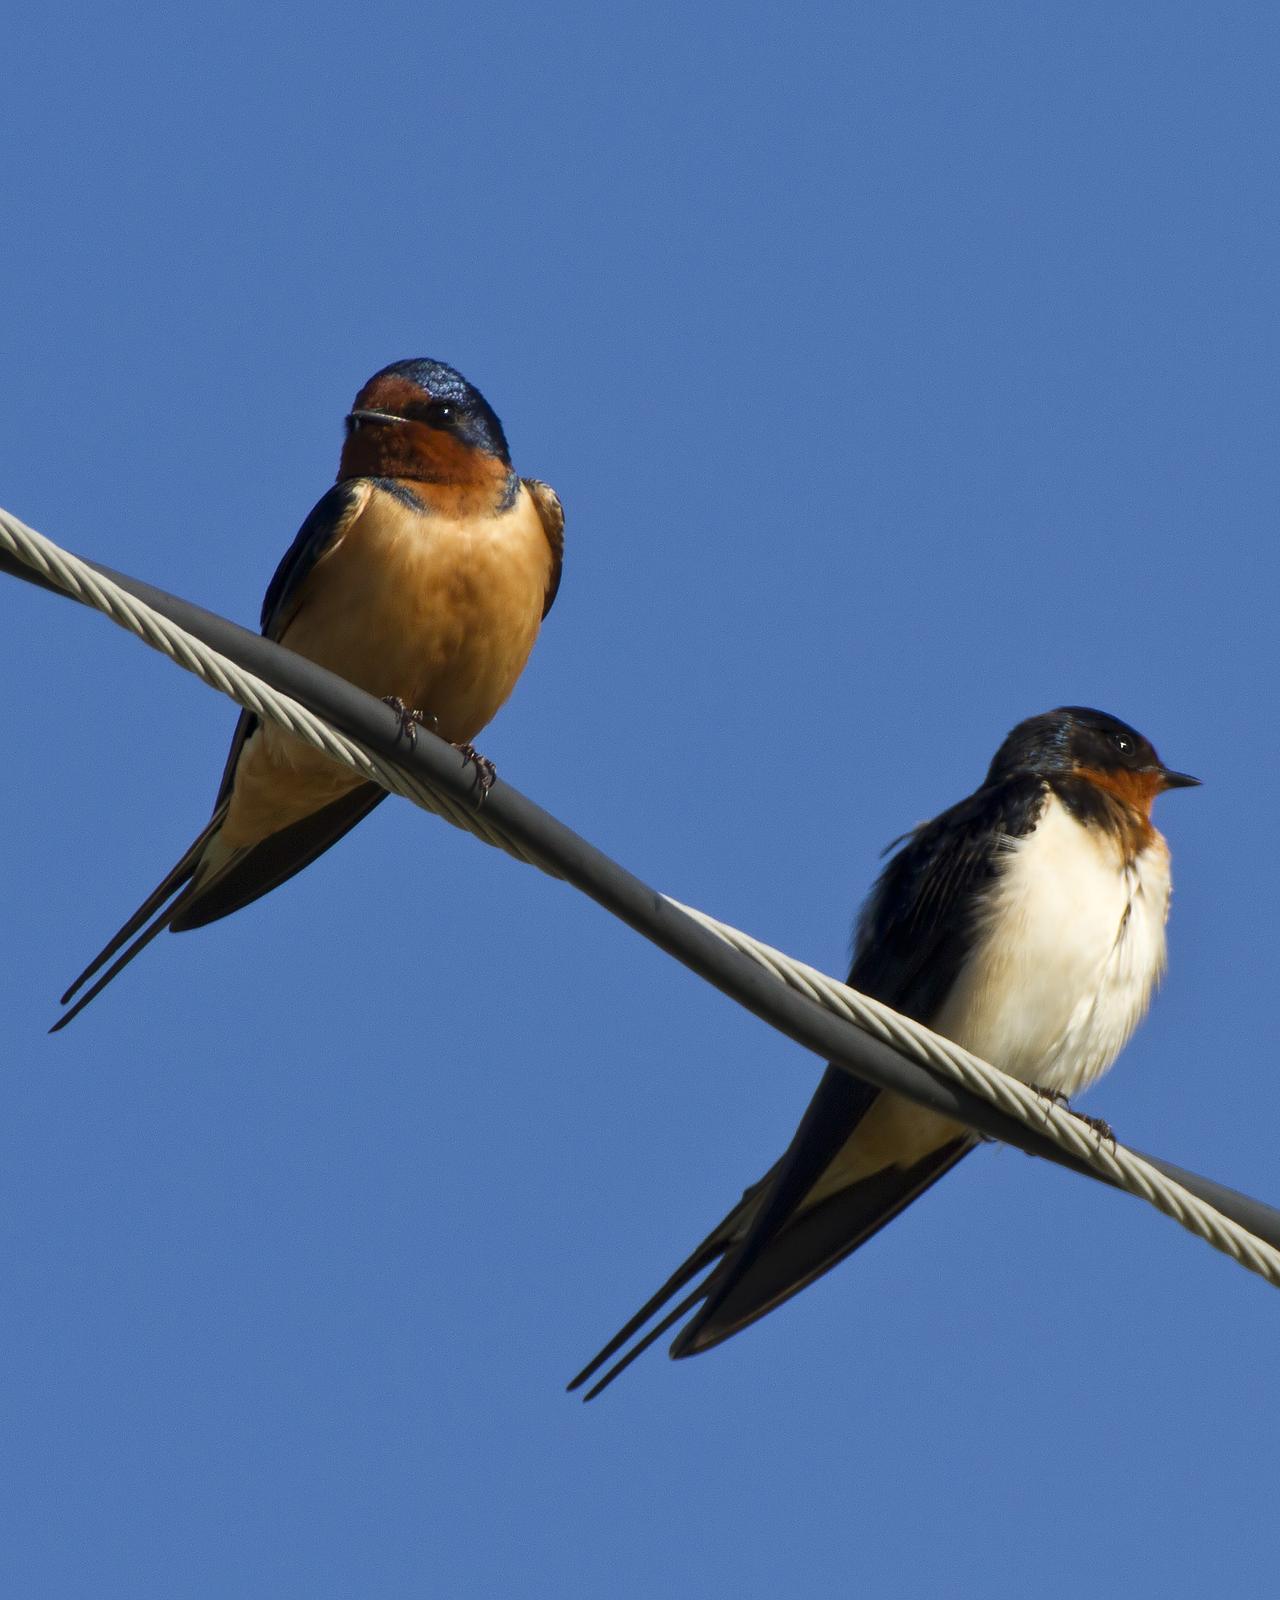 Barn Swallow Photo by Bill Adams